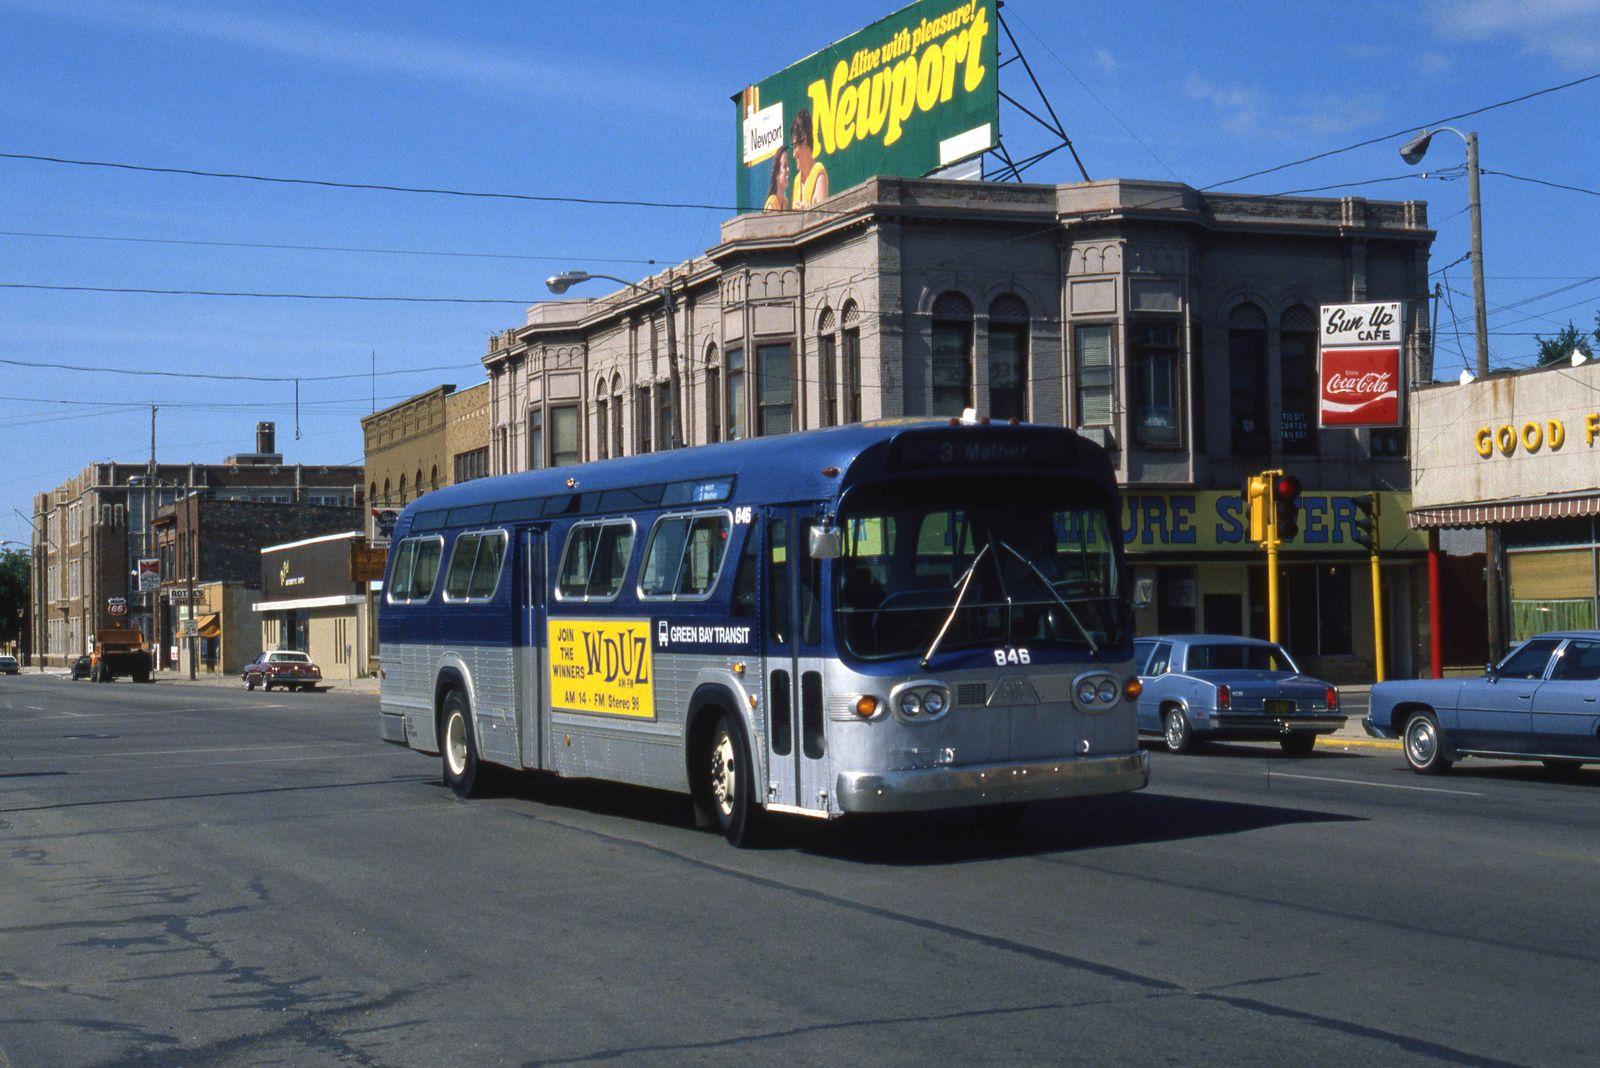 Green Bay Fishbowl Bus Coach Rapid Transit New Bus